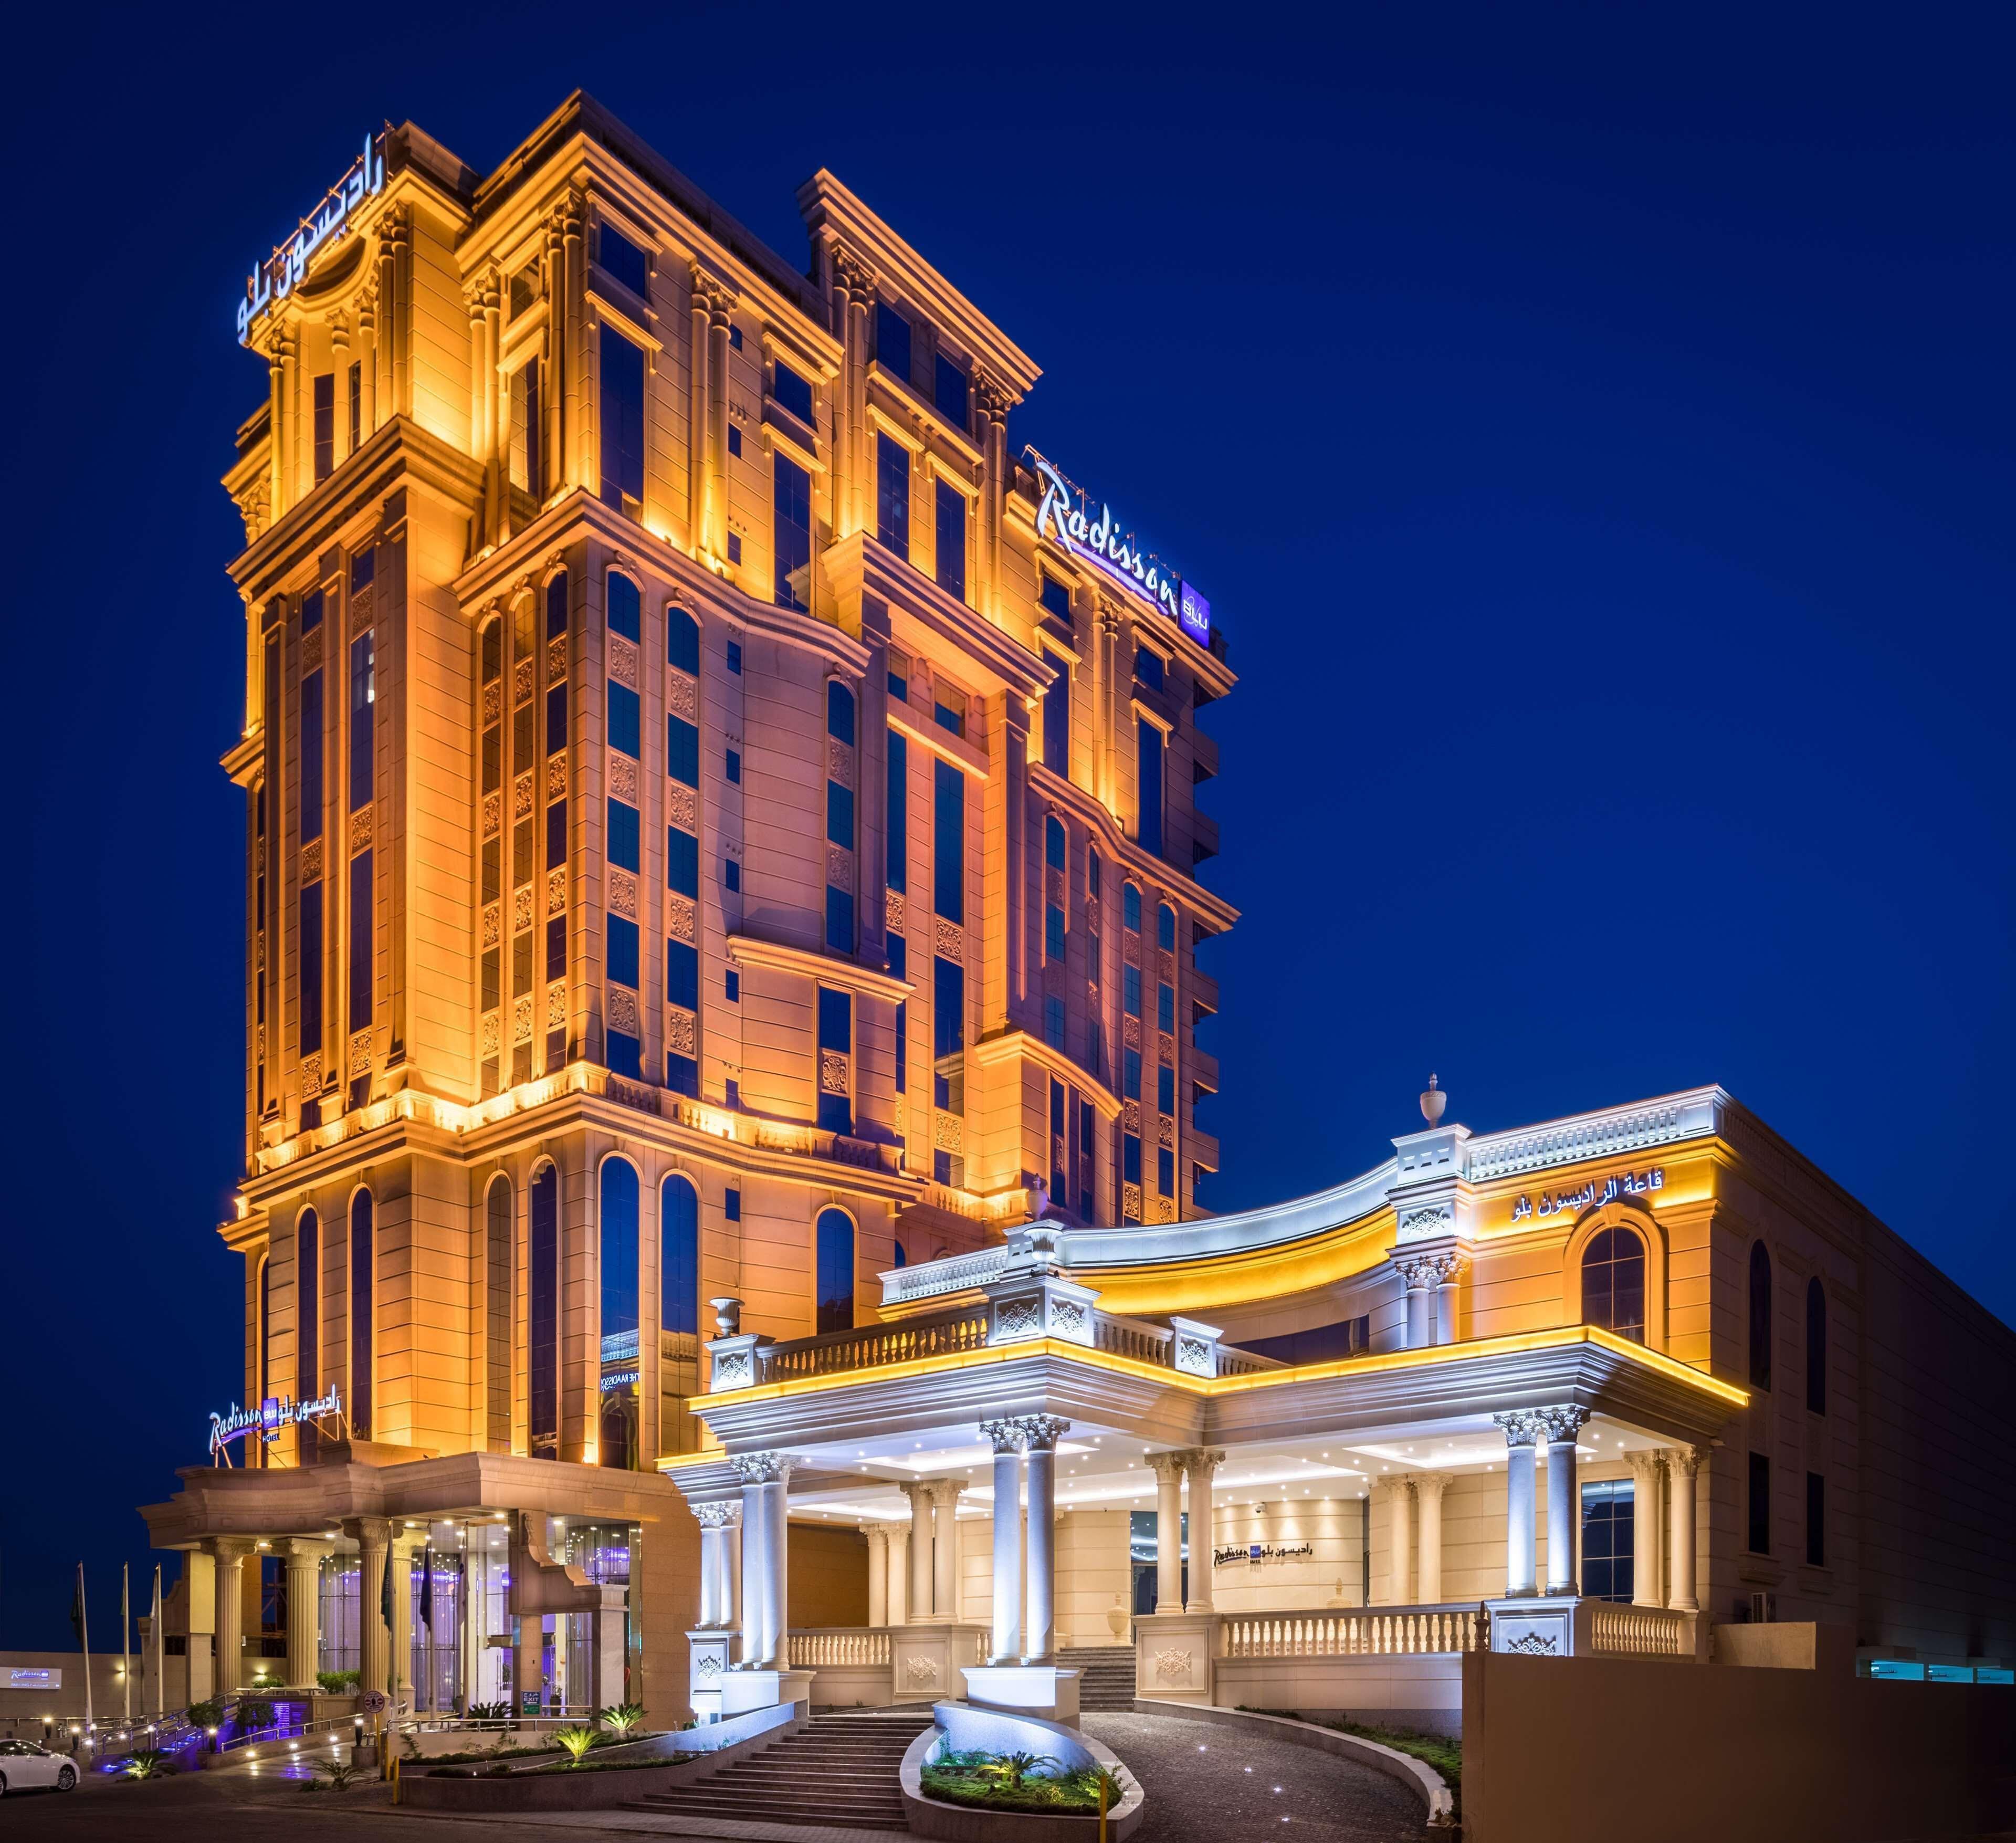 Courtesy of Radisson Blu Hotel, Jeddah Plaza / Expedia